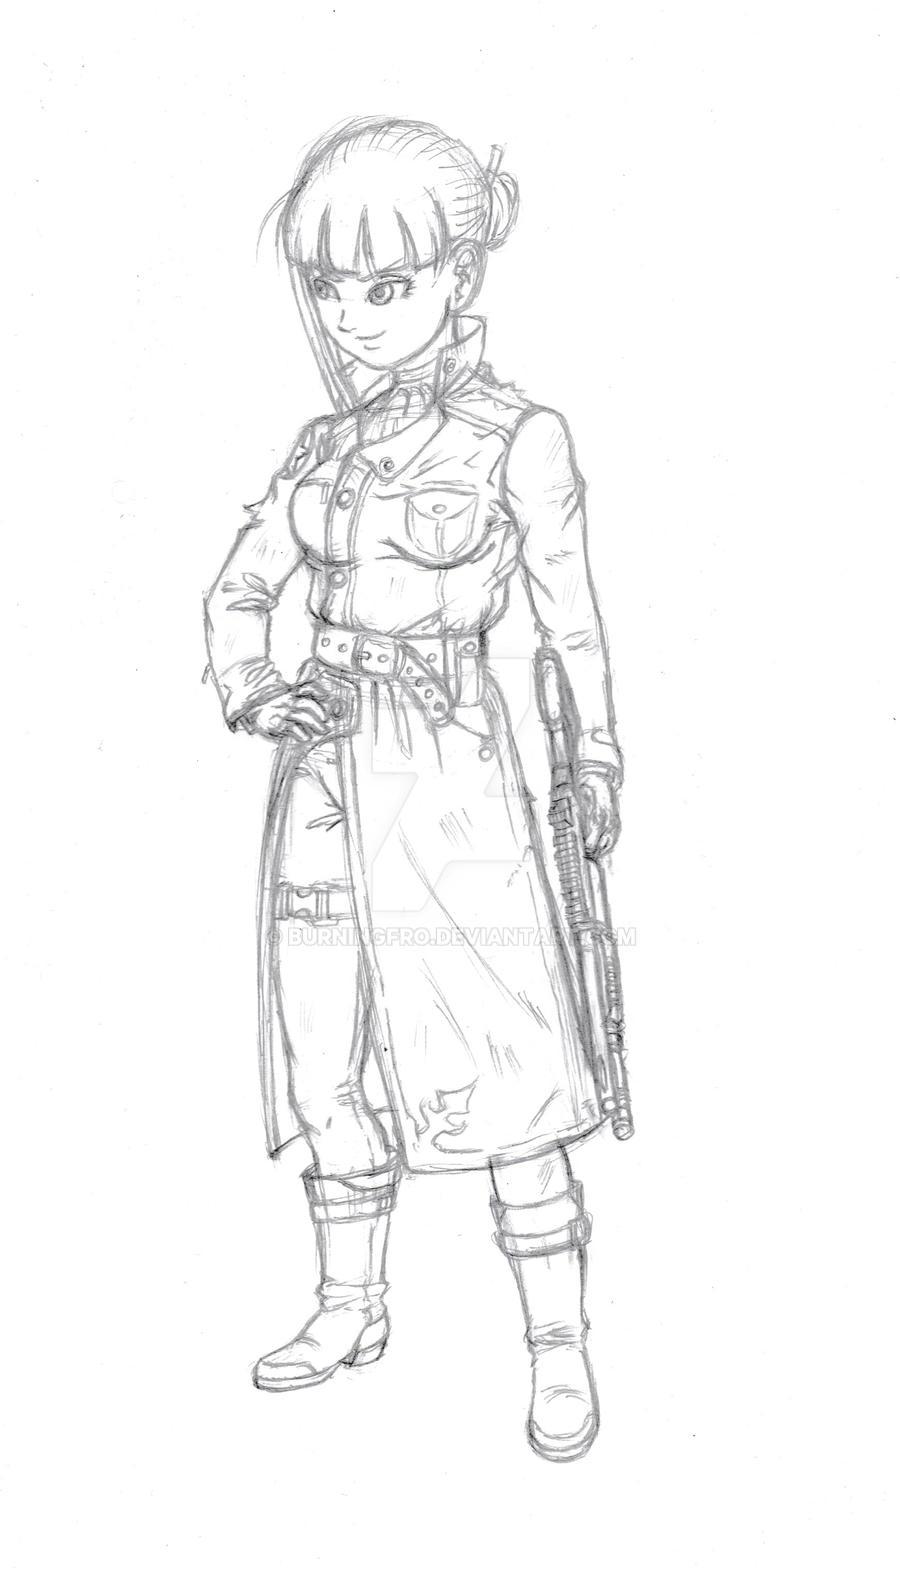 Future Mai sketch by burNiNgFro